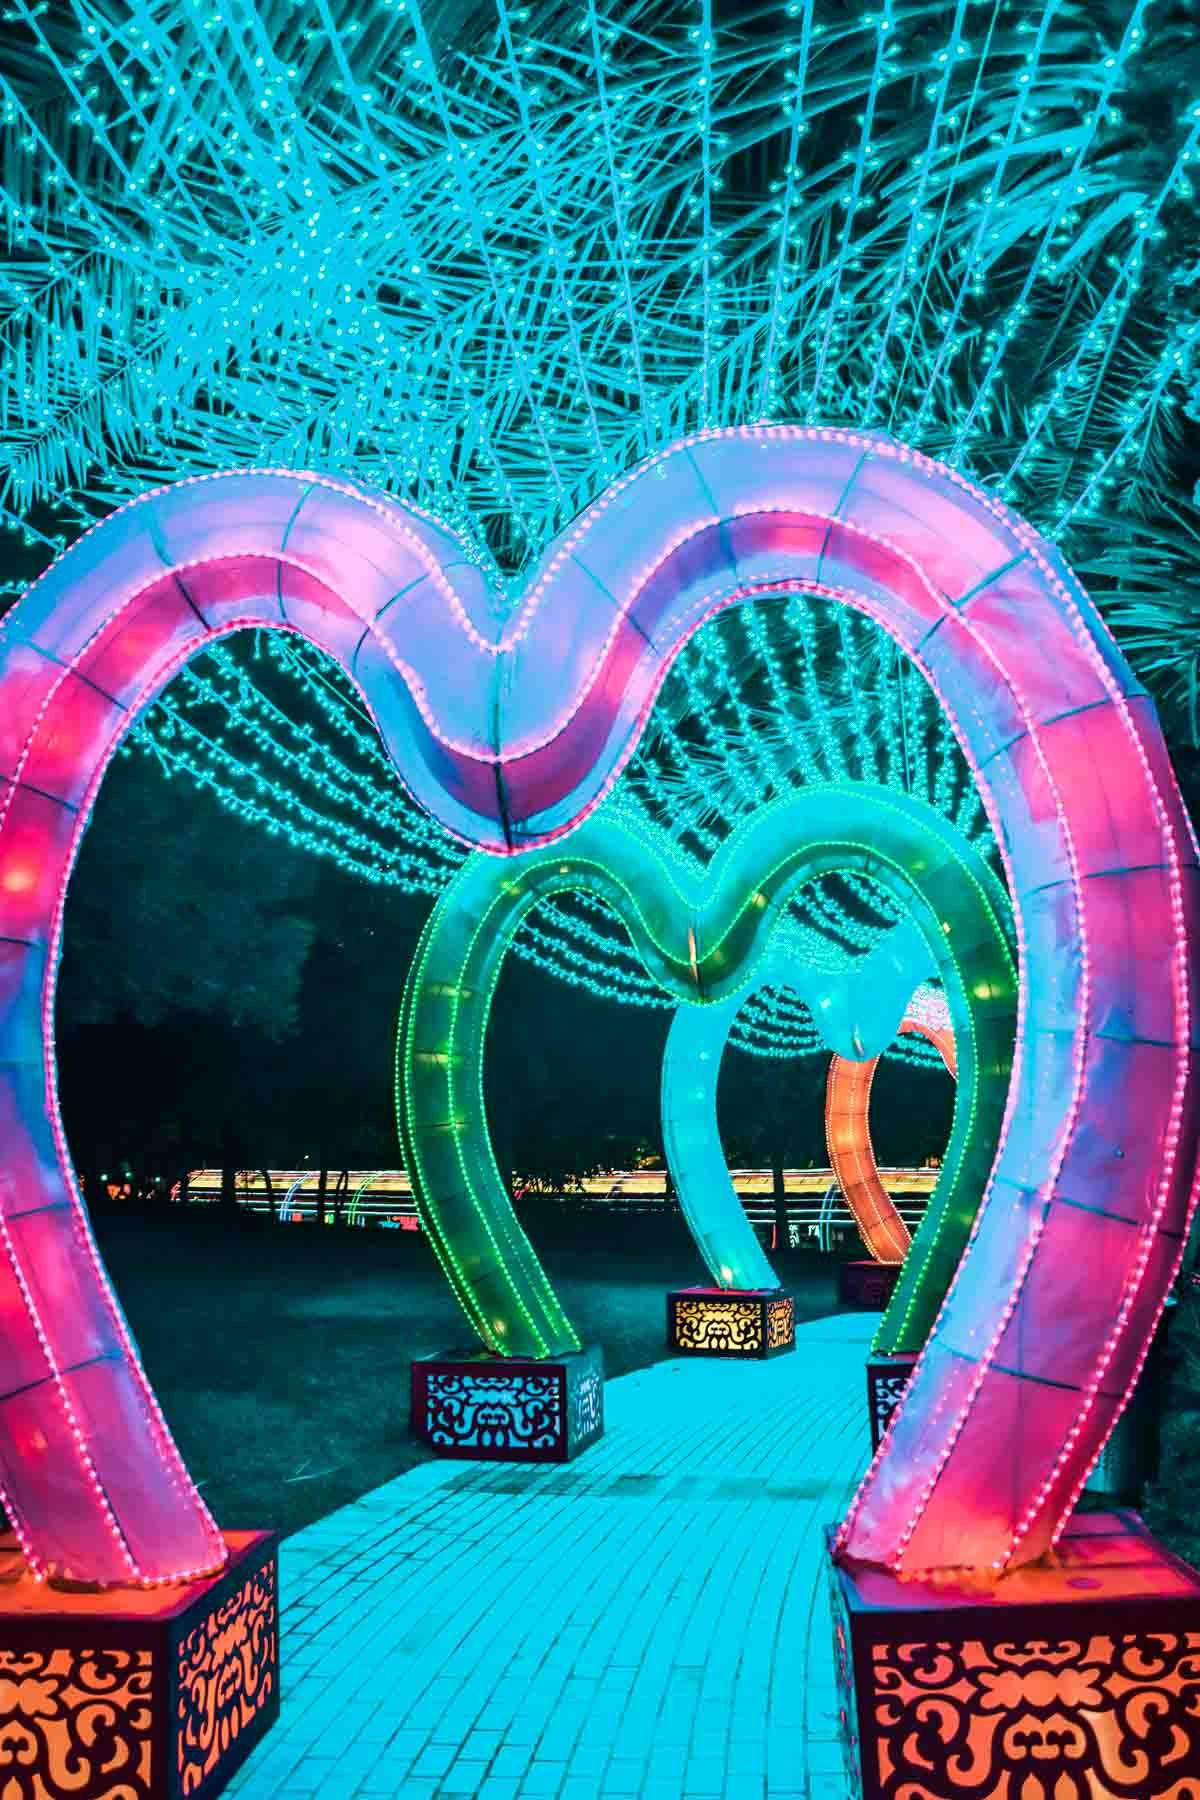 Dubai Garden Glow Best Place To Visit In Dubai At Night Cool Places To Visit Dubai Holidays Dubai Travel